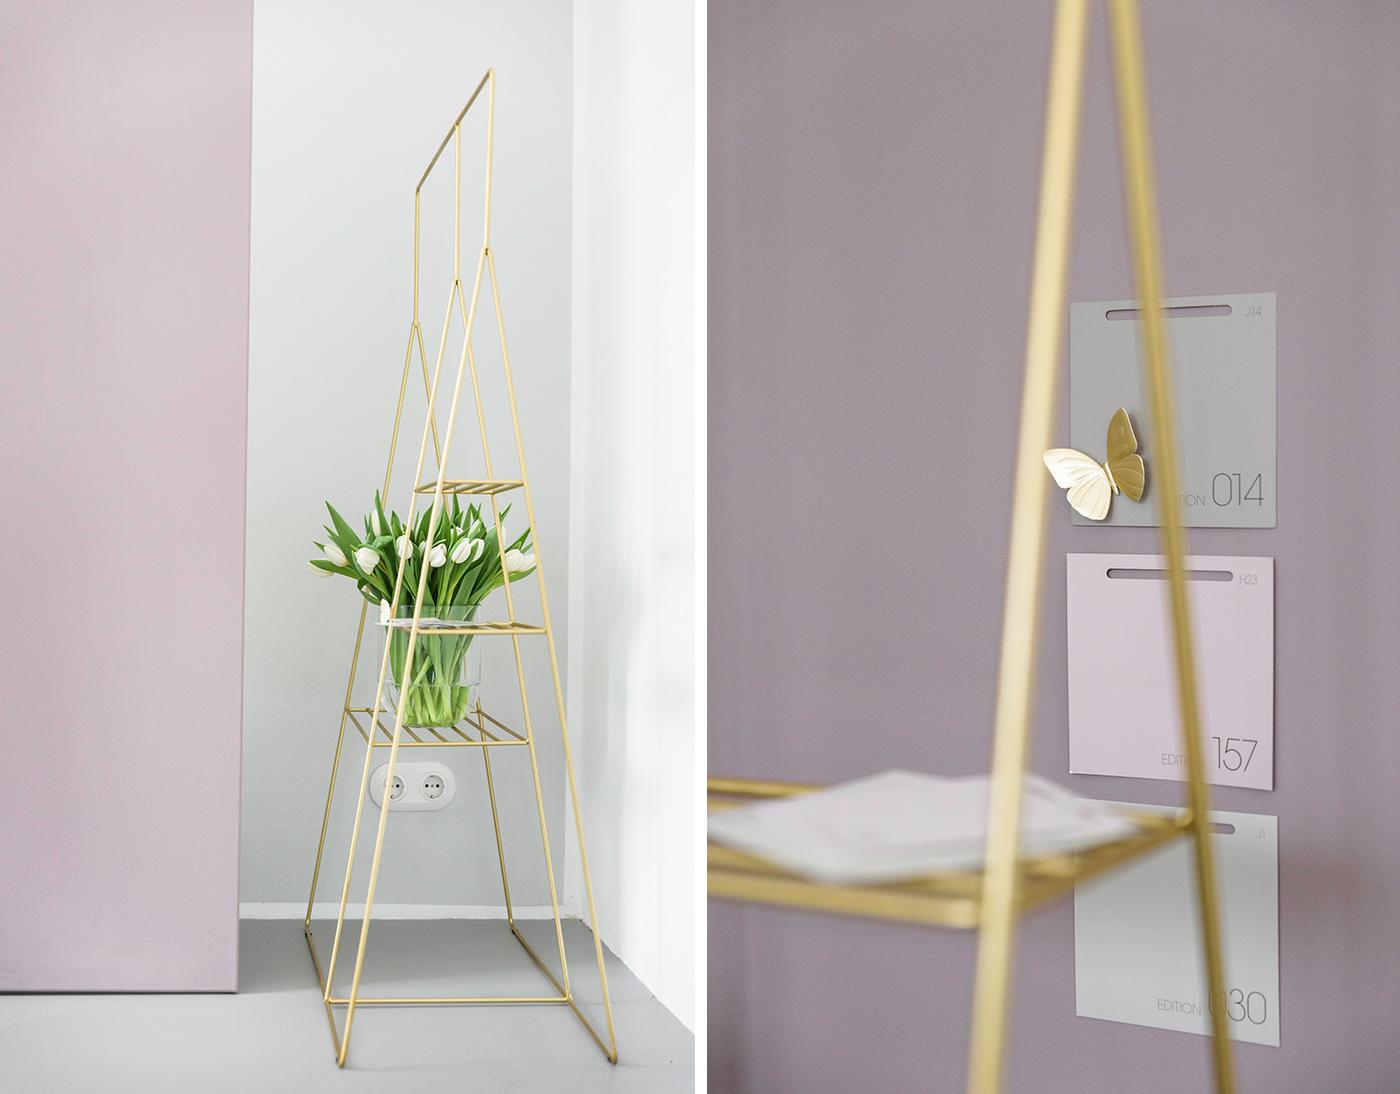 farbe des jahres 2018 trend 100 sch n bei dir by depot. Black Bedroom Furniture Sets. Home Design Ideas